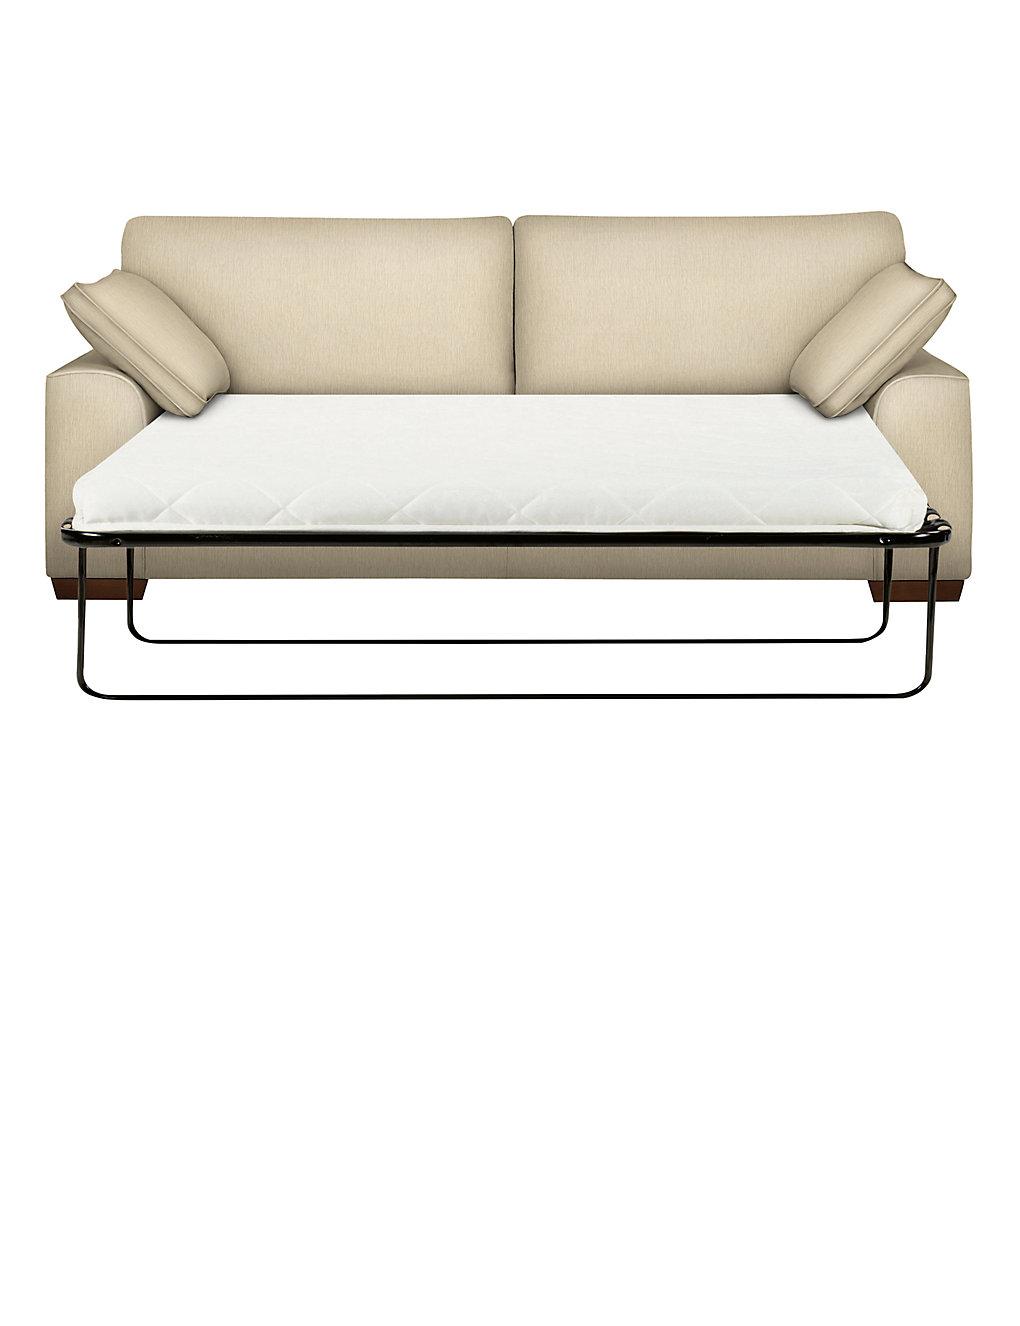 Nantucket Bedroom Furniture Nantucket Large Sofa Bed Sprung Ms